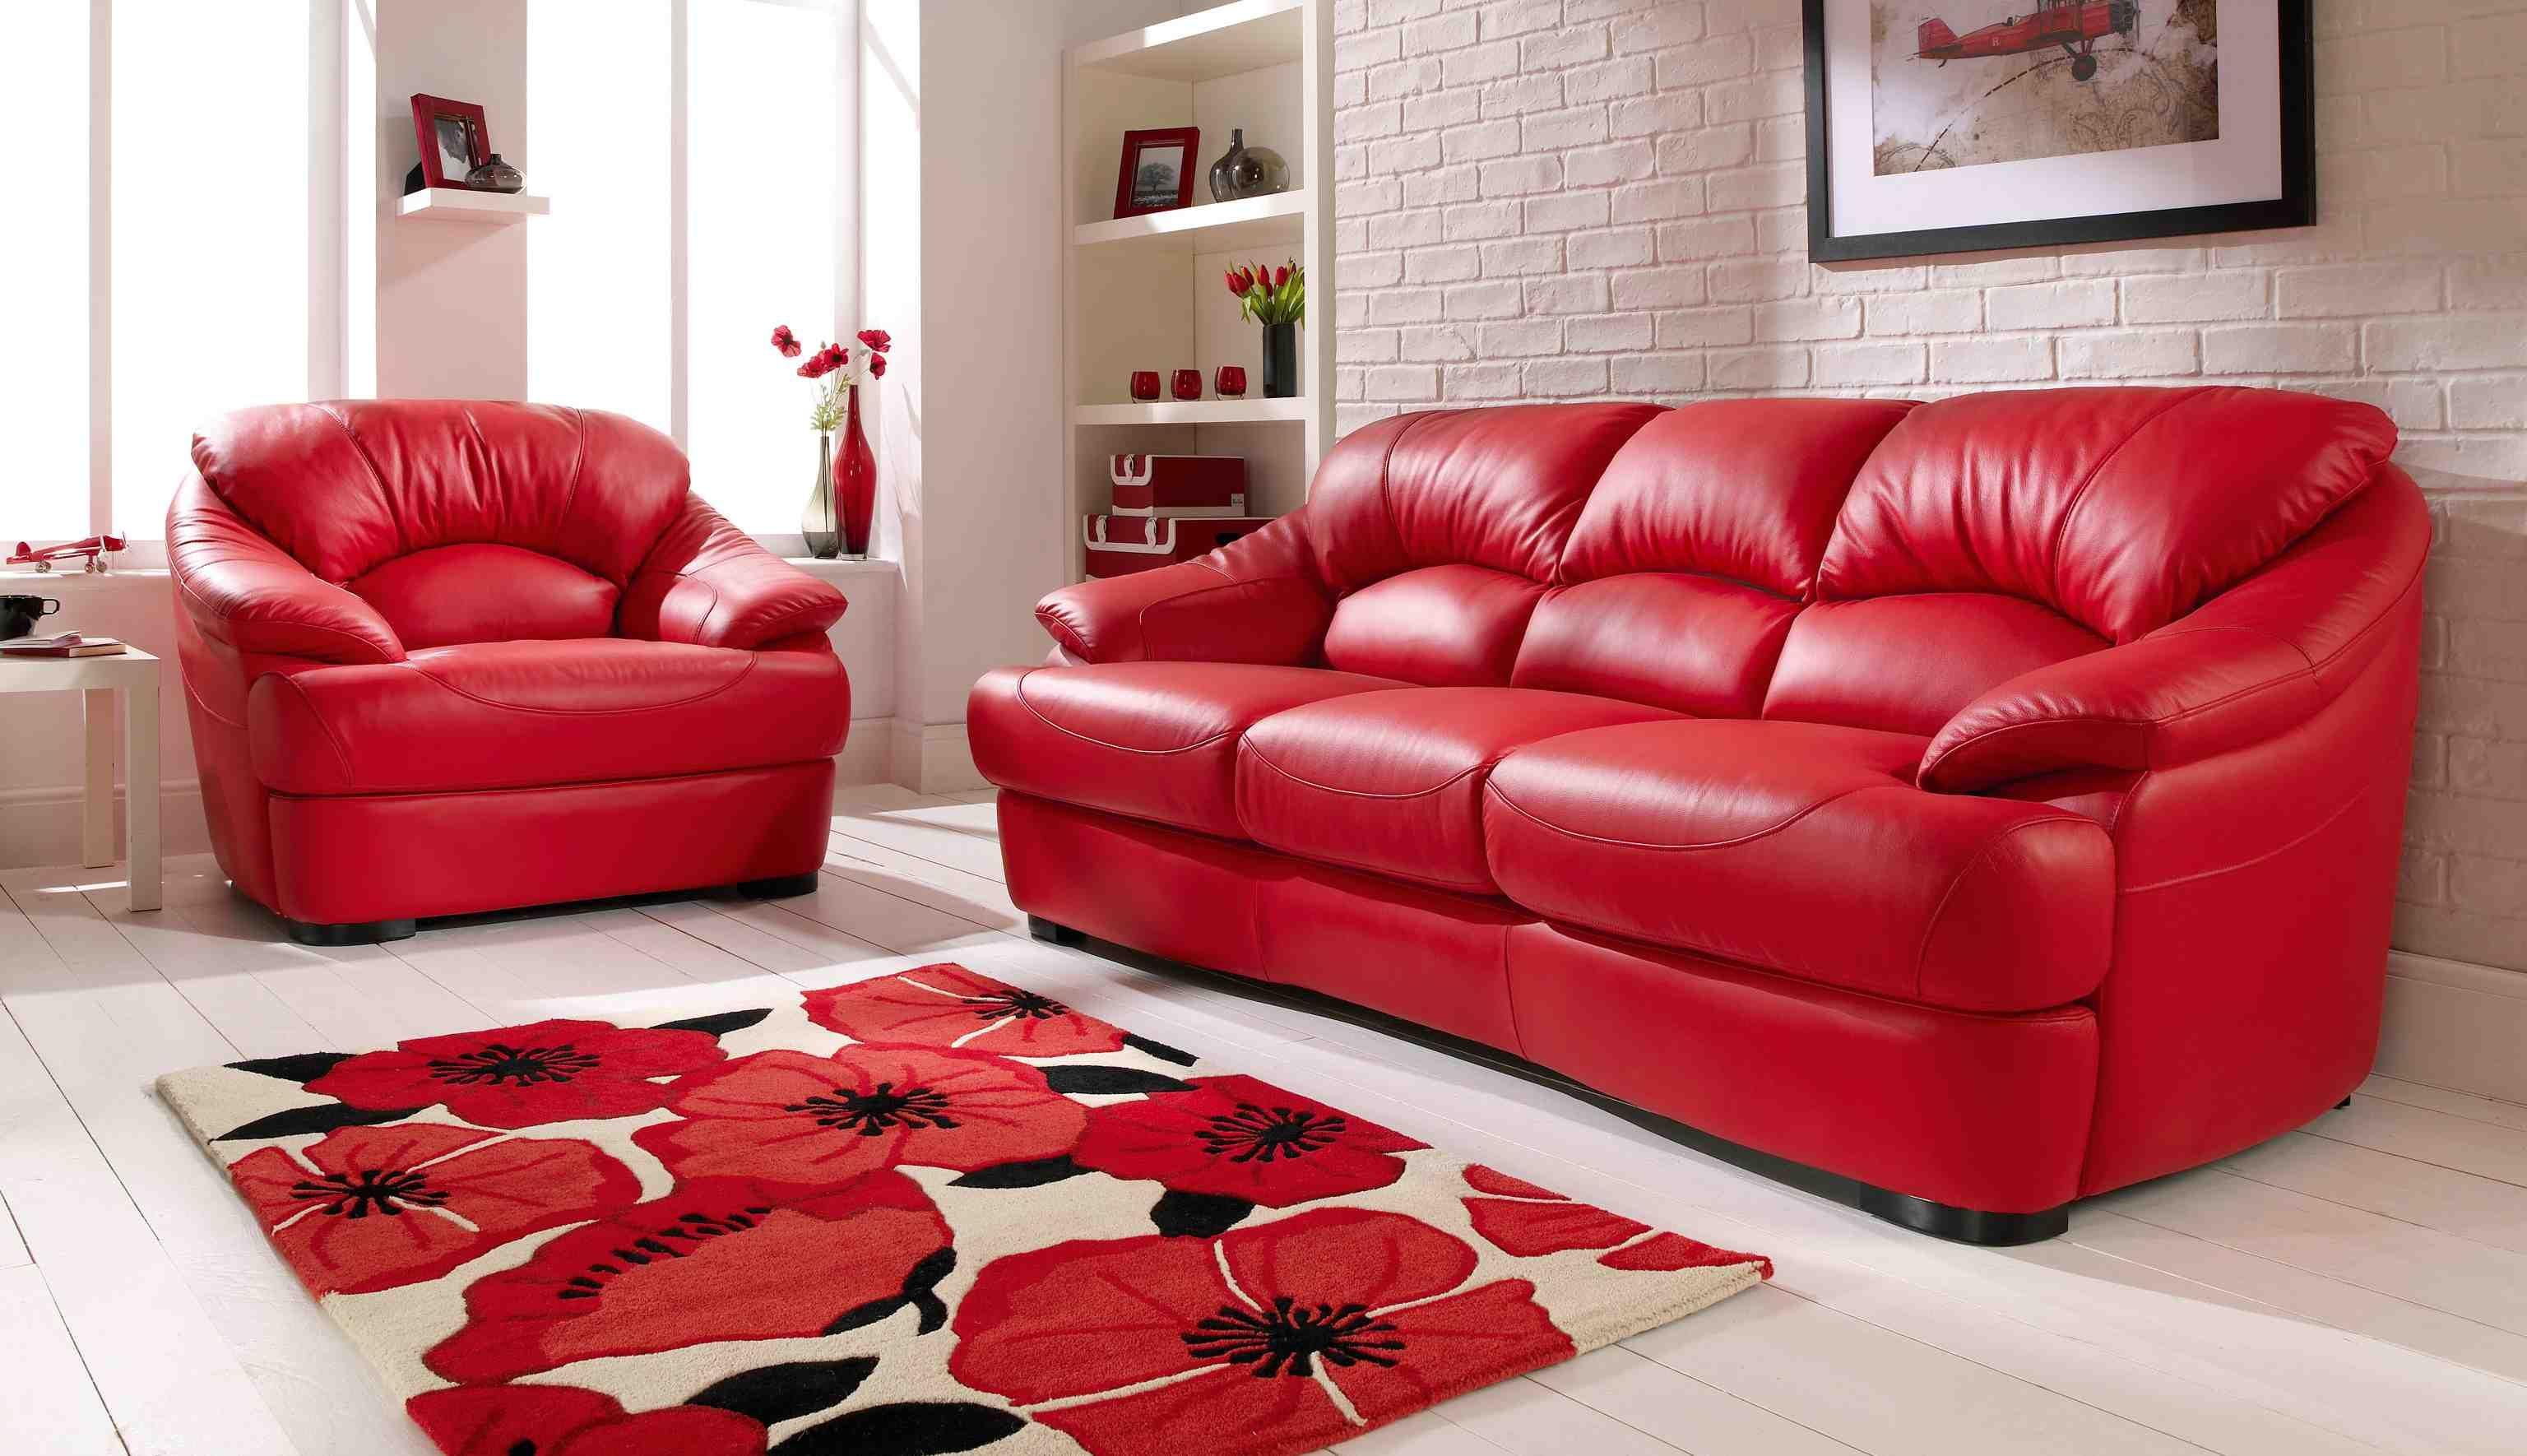 casablanca cream 3 piece leather suite3072 x 1770 243 1 kb www